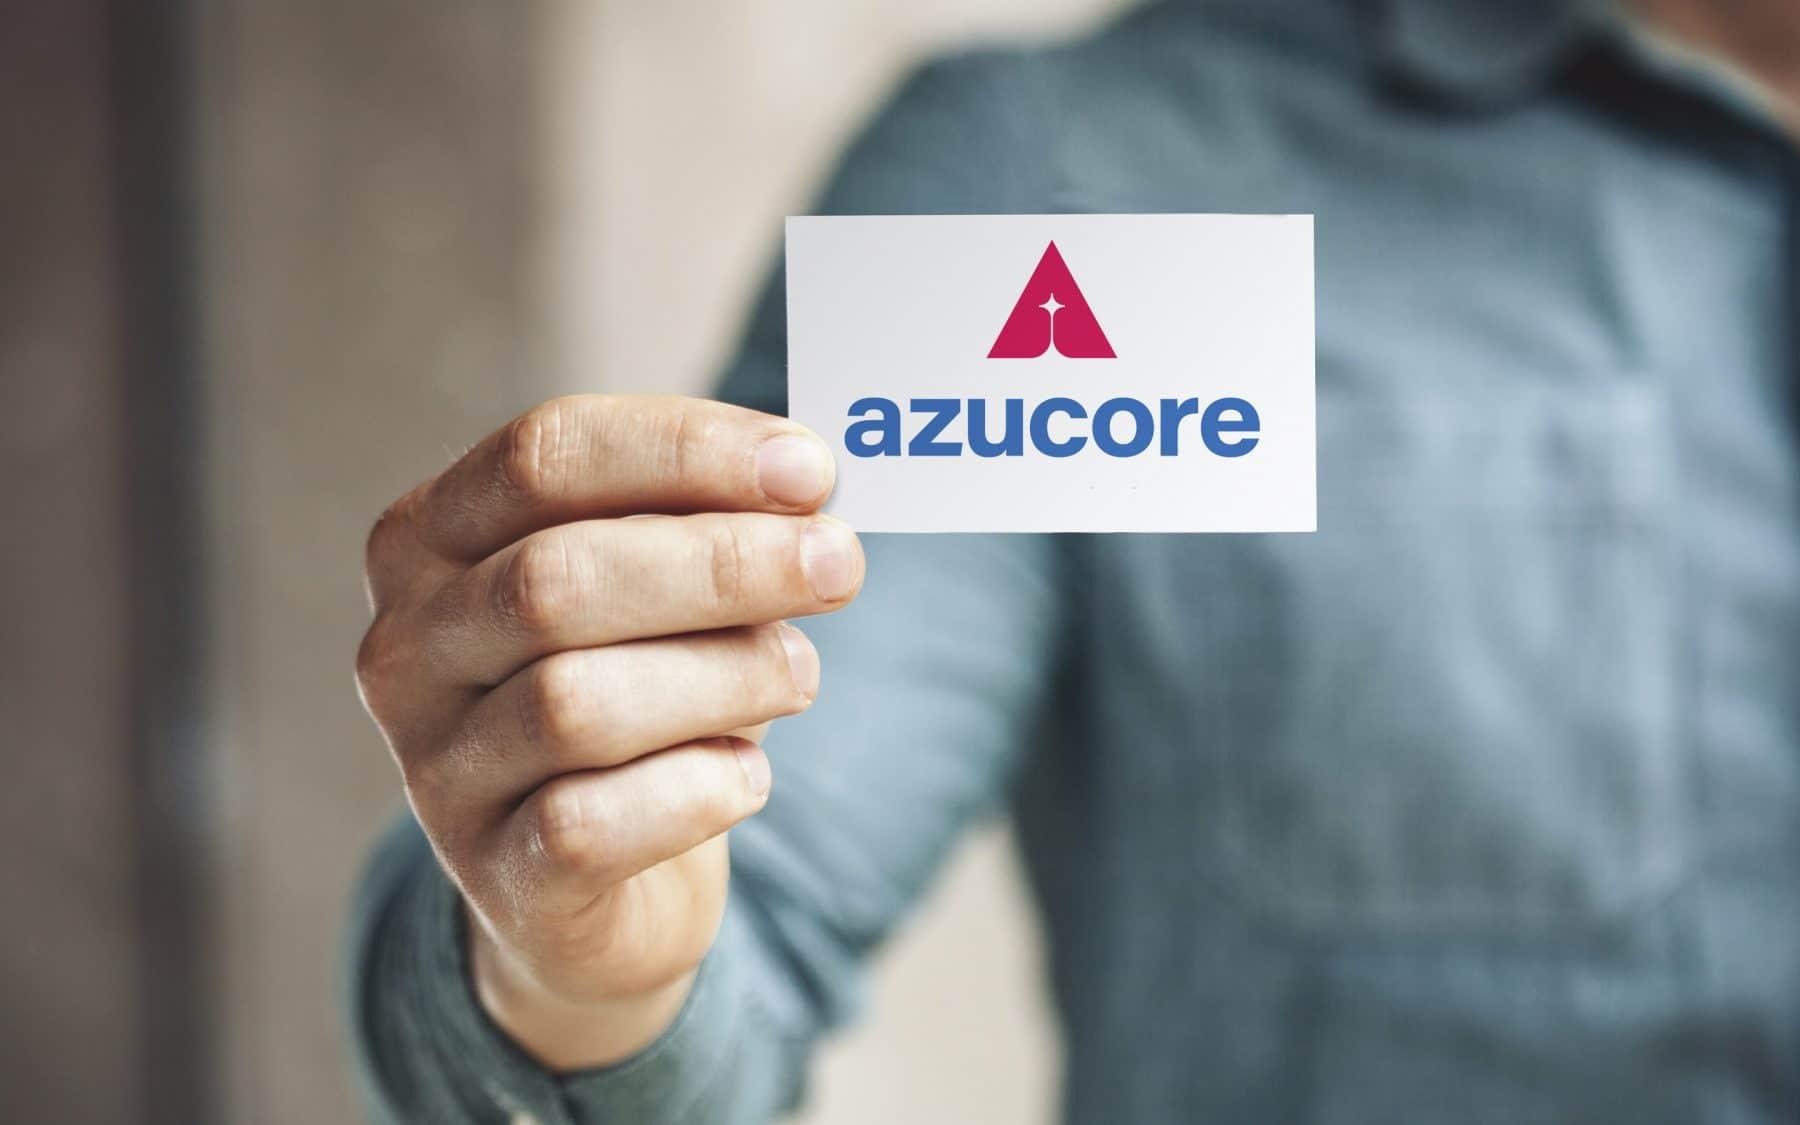 Azucore